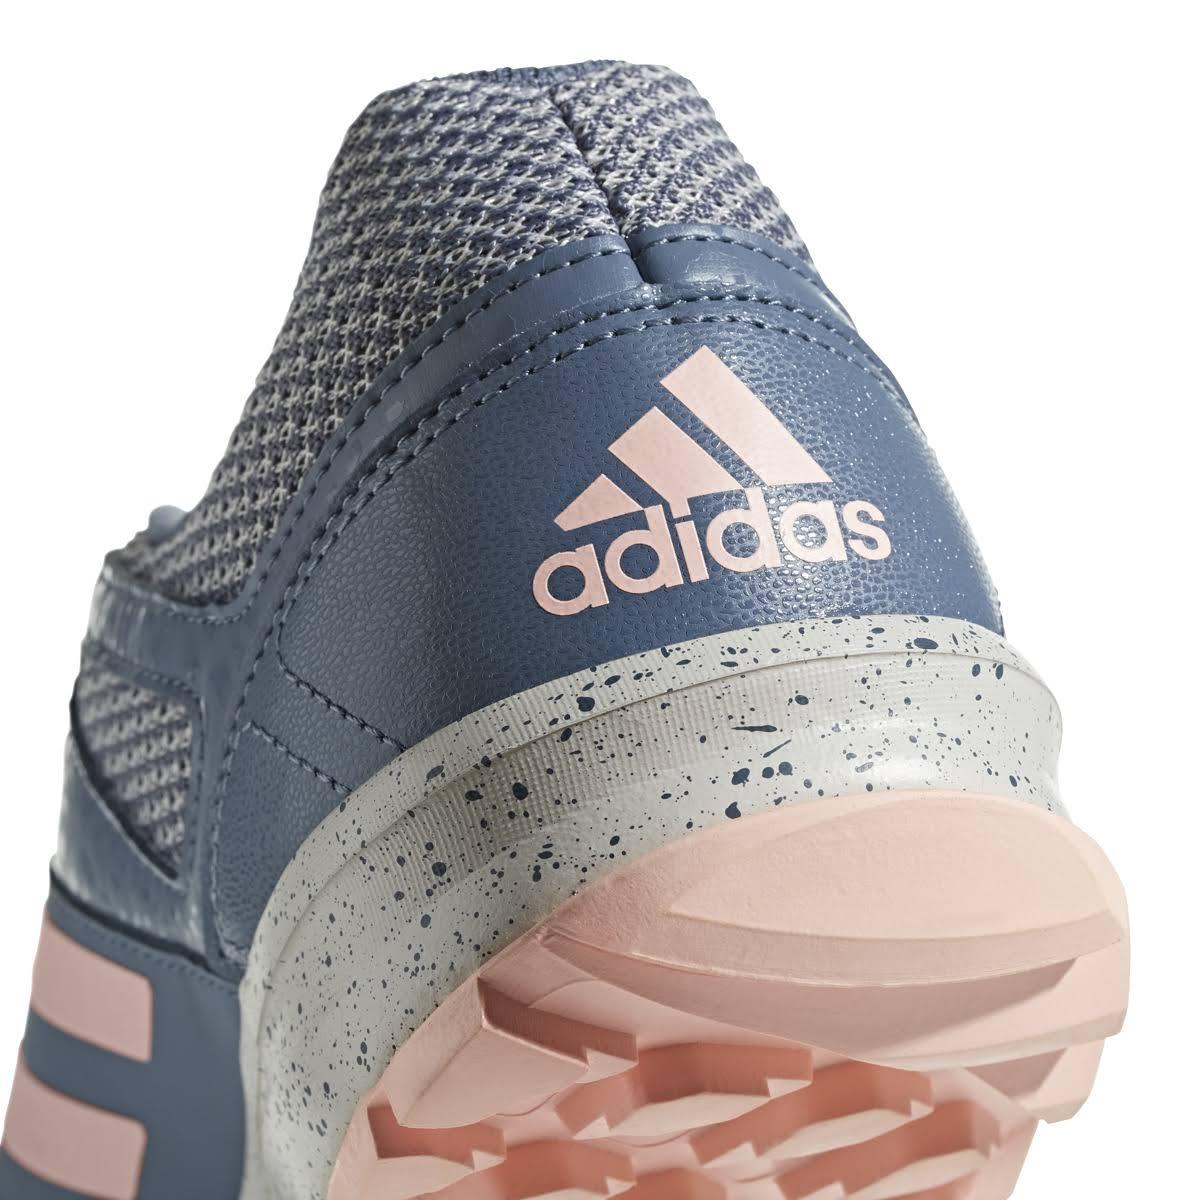 Field Schuhe Fabela Turf Adidas Rise 10½ Frauen Hockey SxBqPAw8t